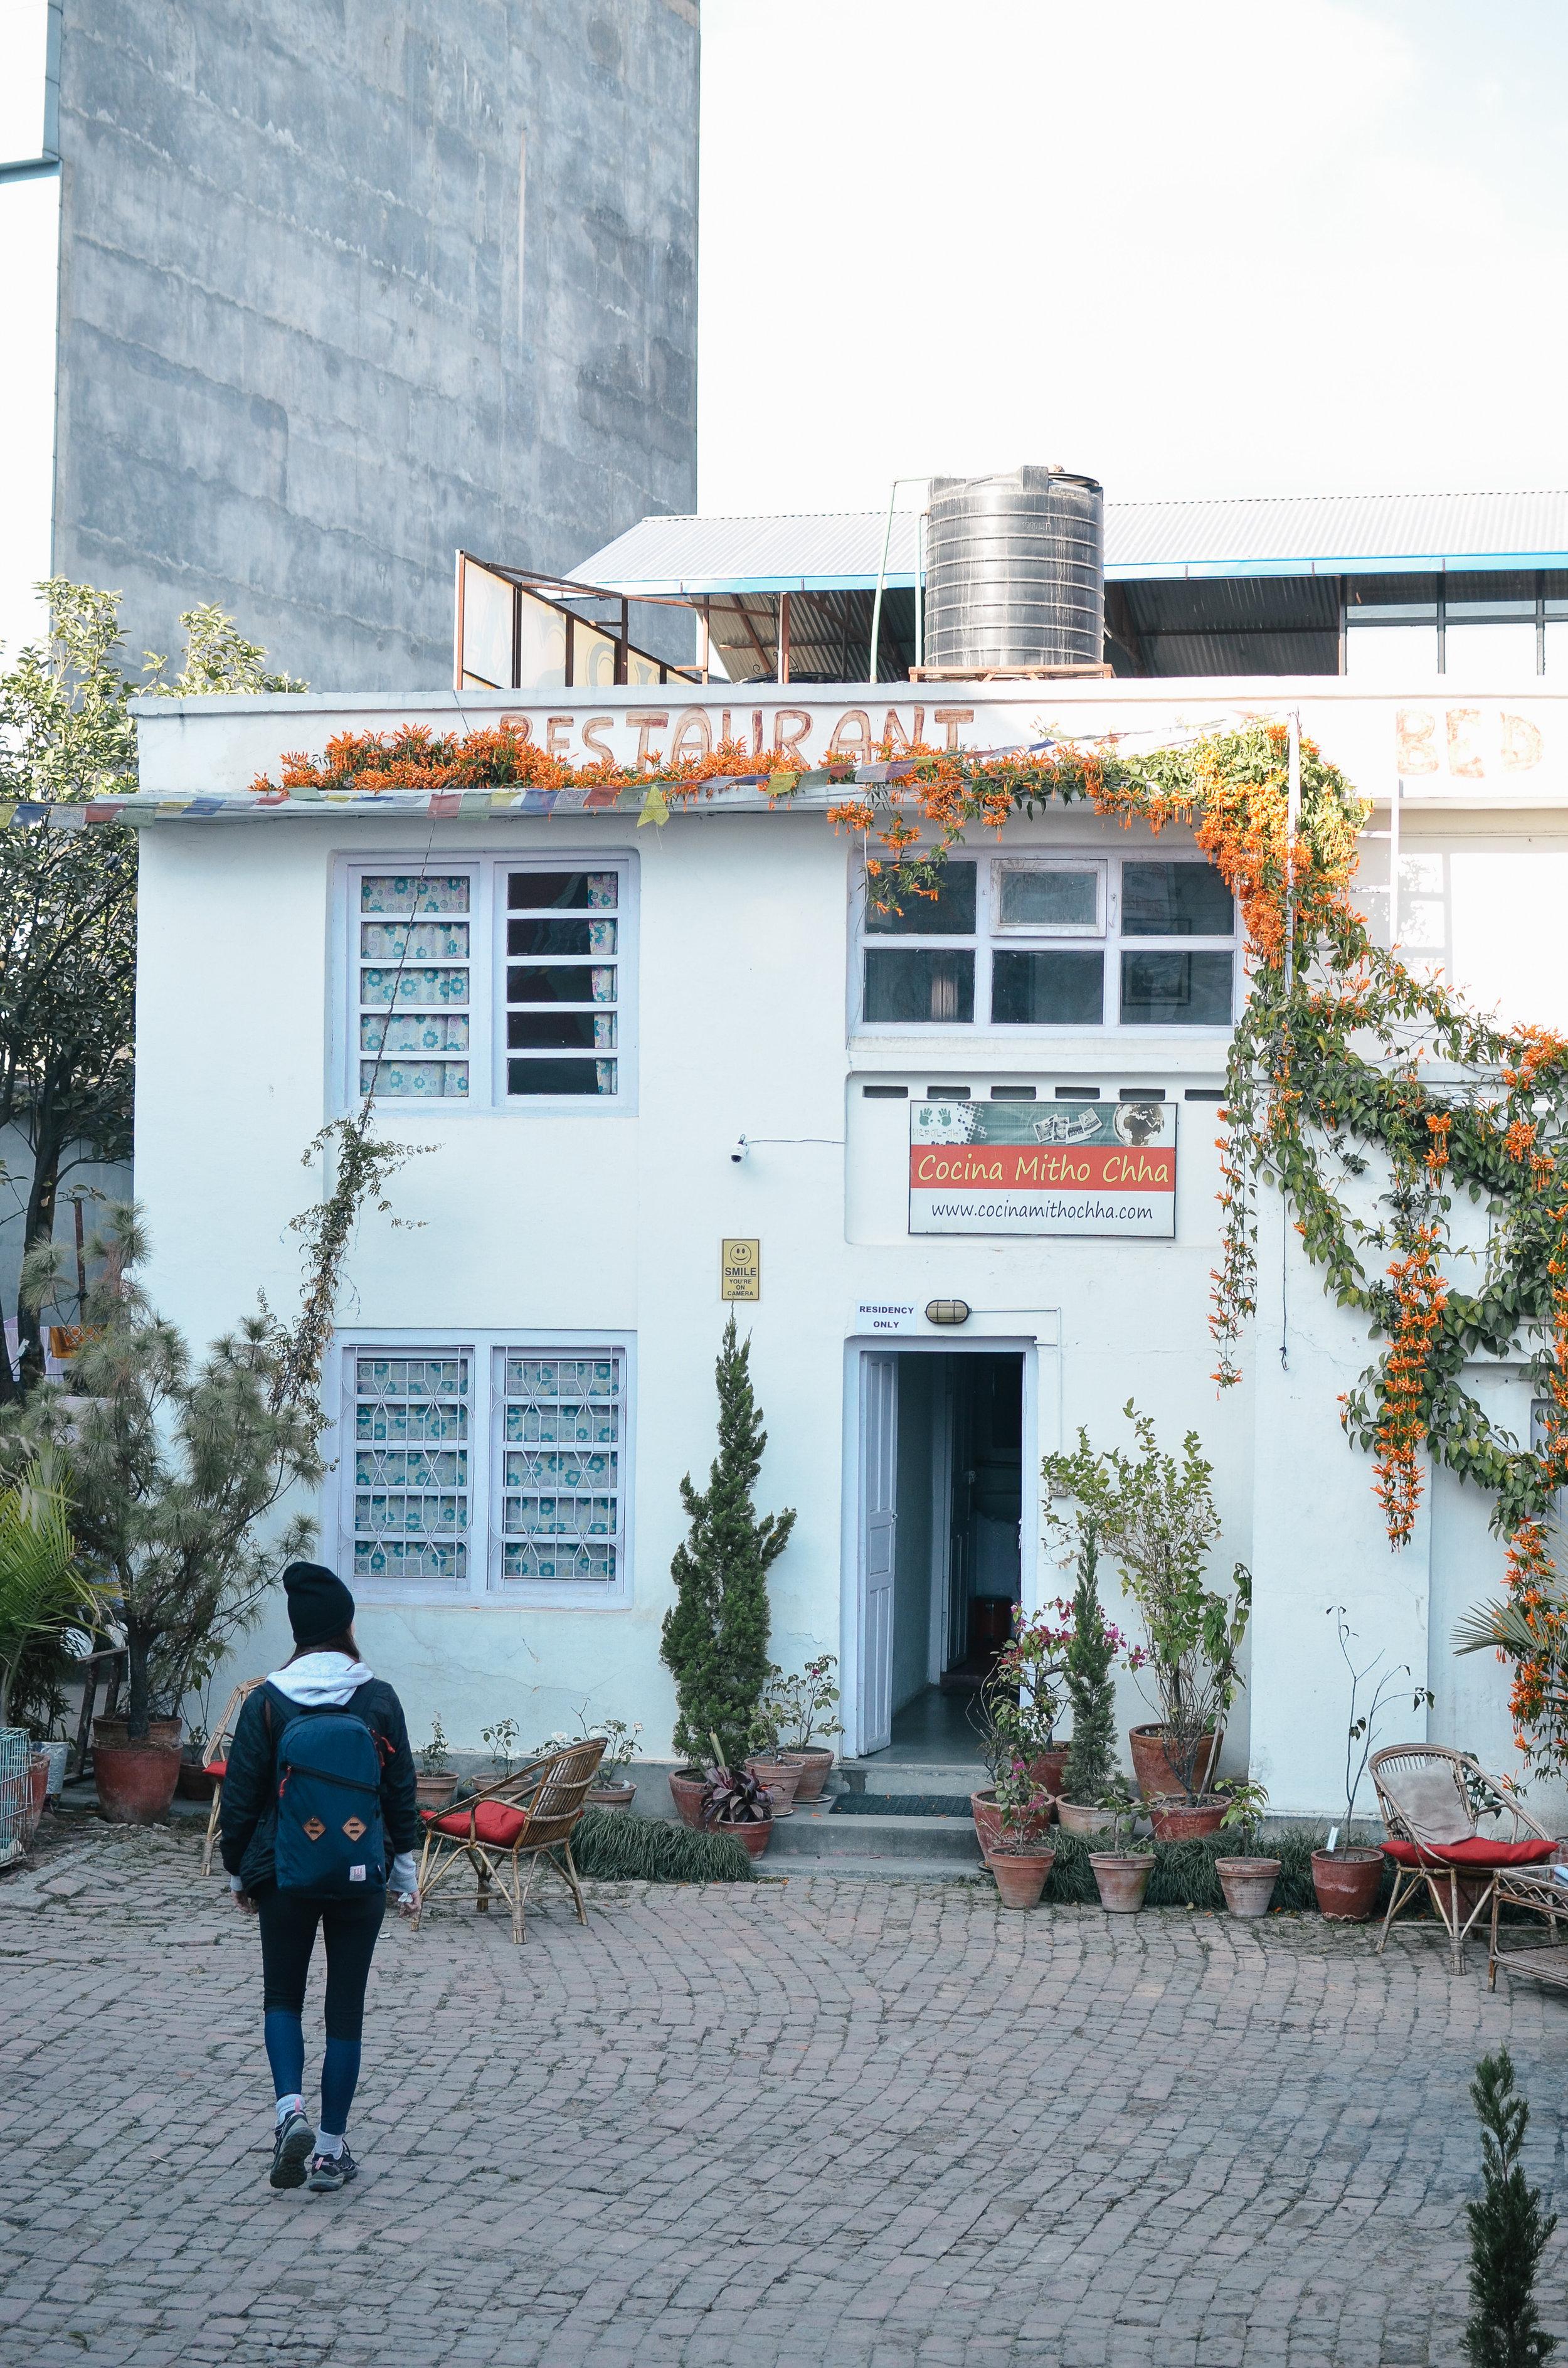 10-things-to-know-kathmandu-nepal-lifeonpine_DSC_0554.jpg